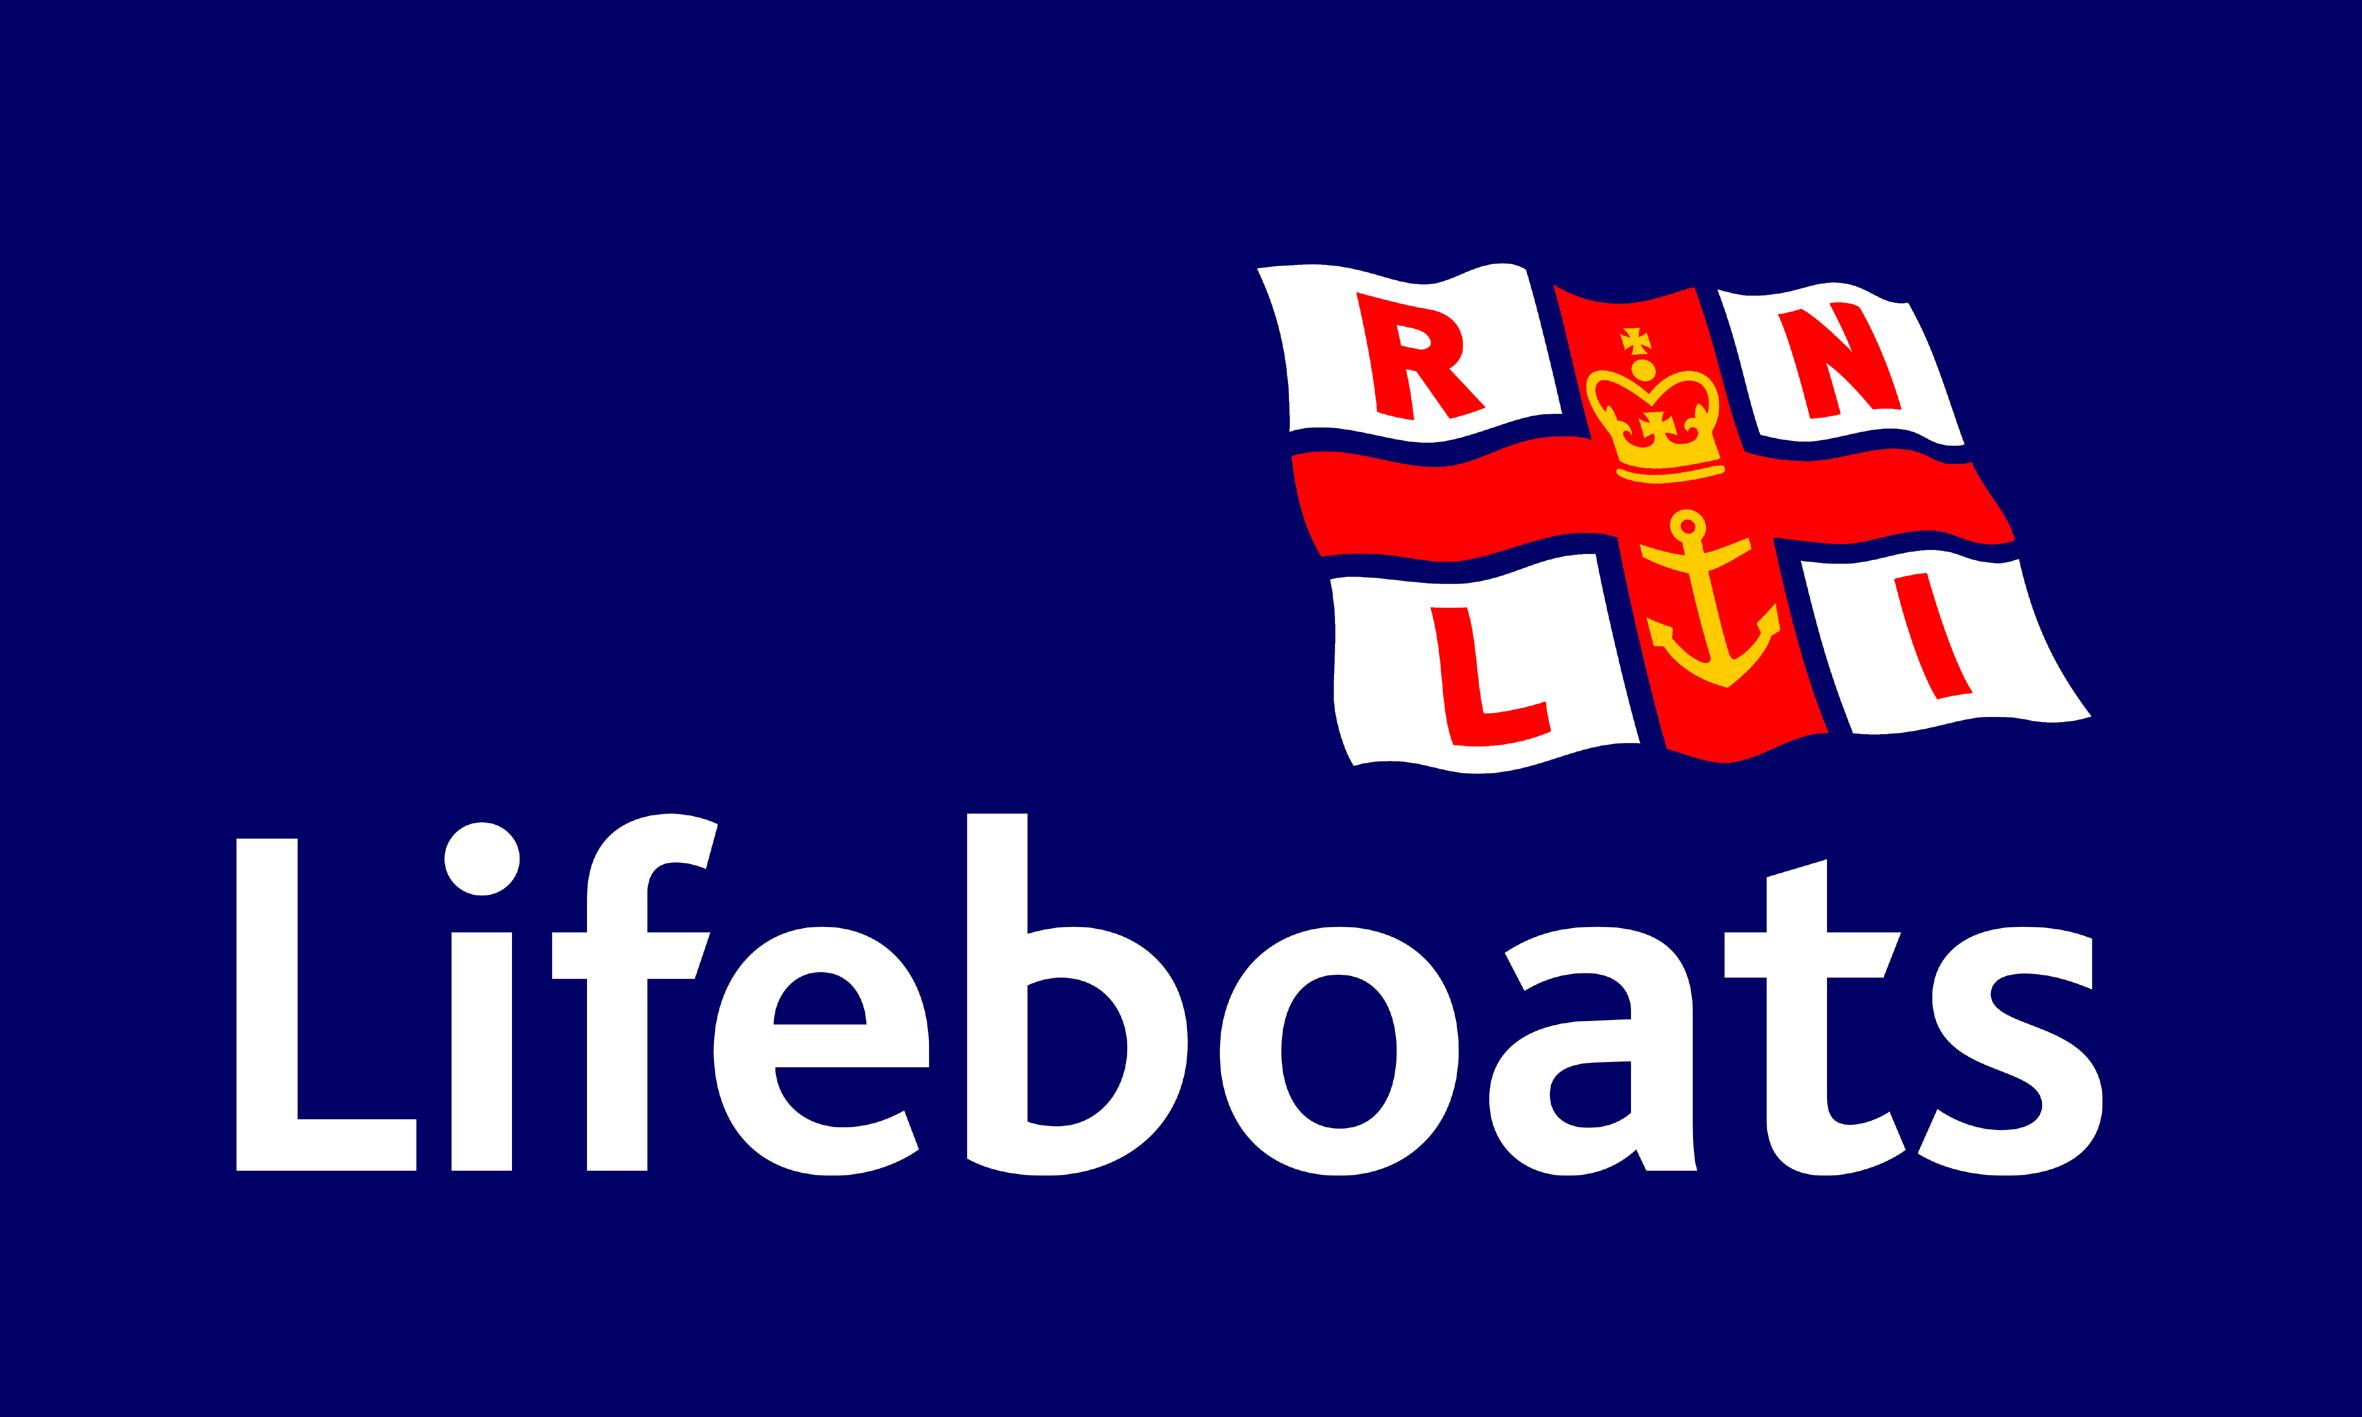 lifeboat quiz